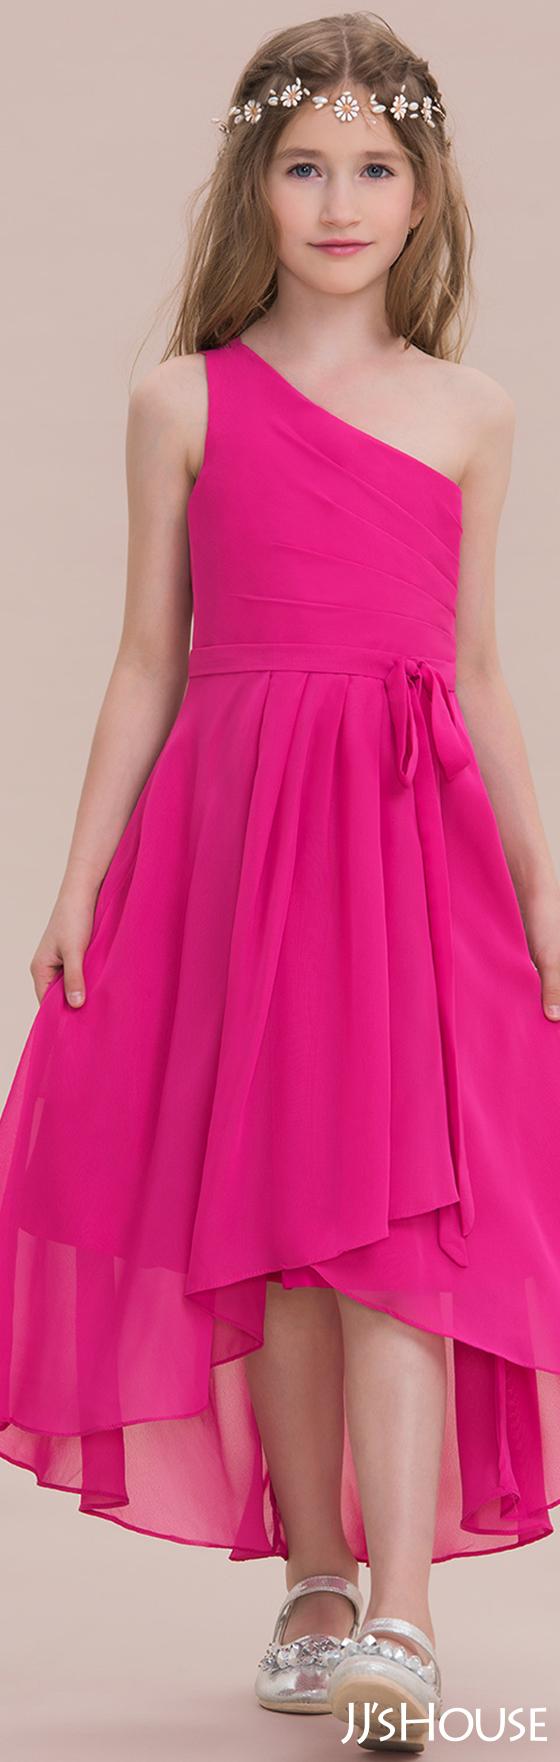 nice dress. nice design #JJsHouse #Junior #Bridesmaid | Isabella ...